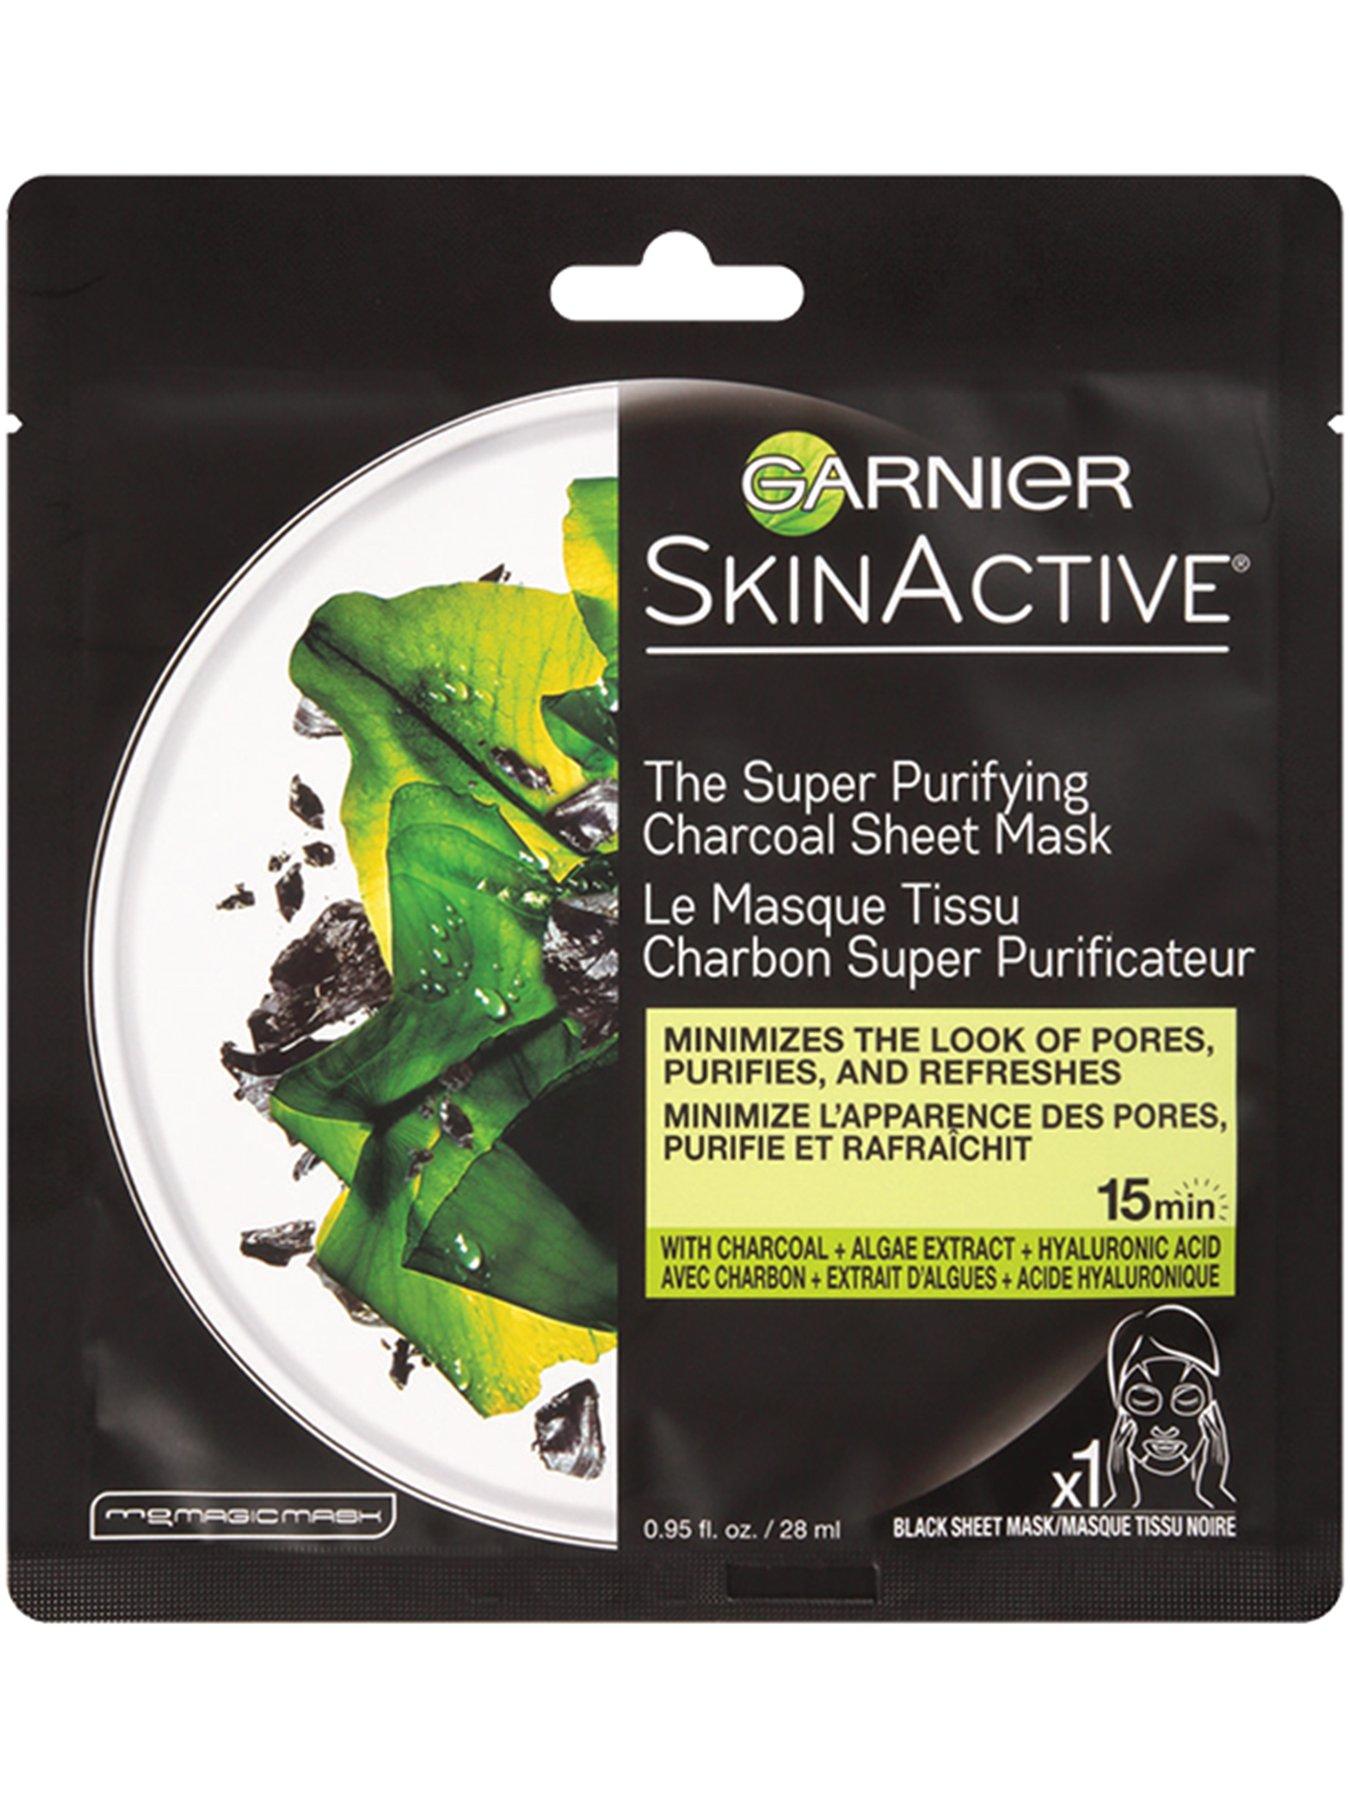 Garnier SkinActive Super Purifying Charcoal Facial Mask